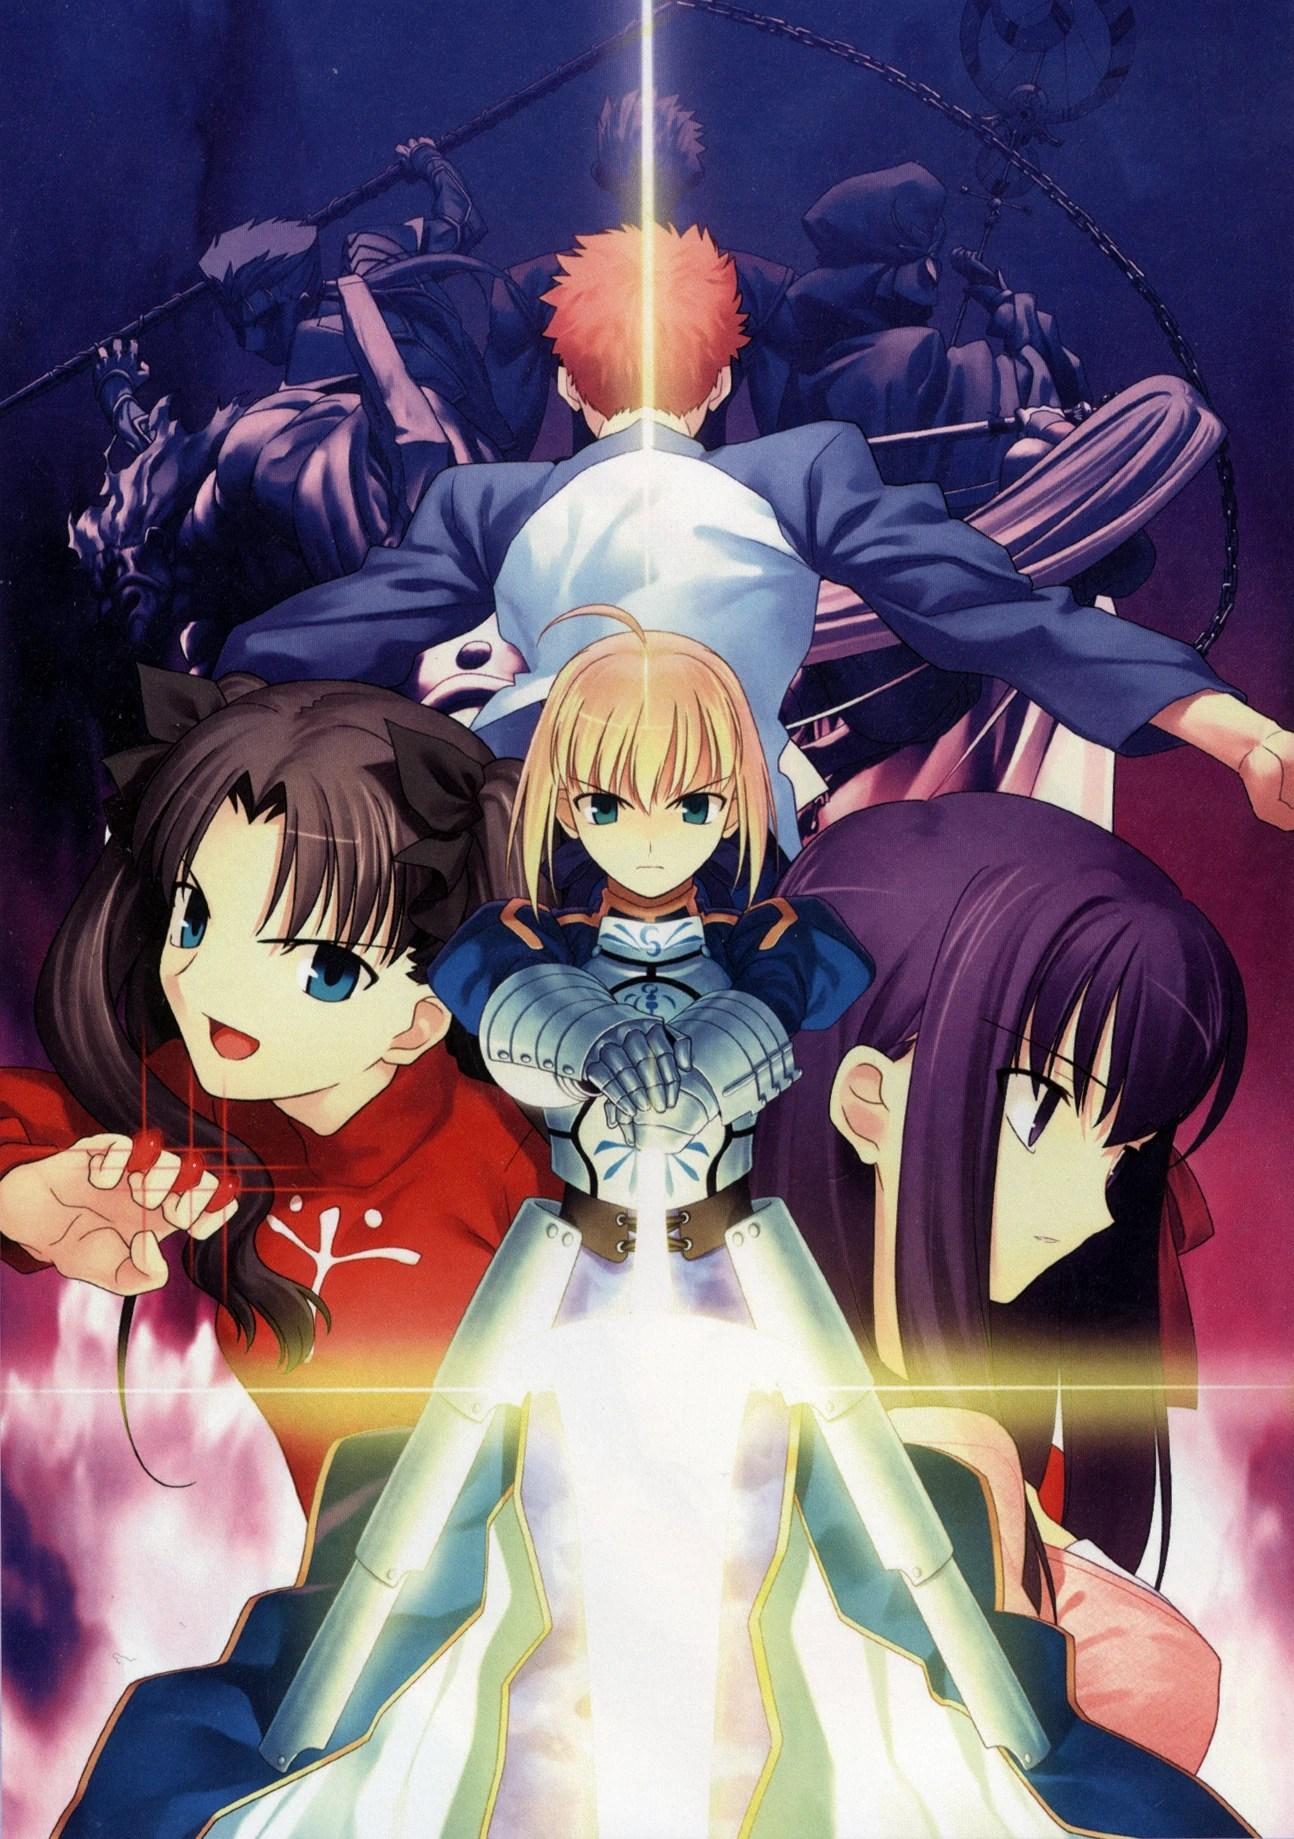 Anime Moon Wallpaper 命運長夜 Fate Stay Night 線上看 最全在線動畫 動漫收集網站 Www Oiihk Com